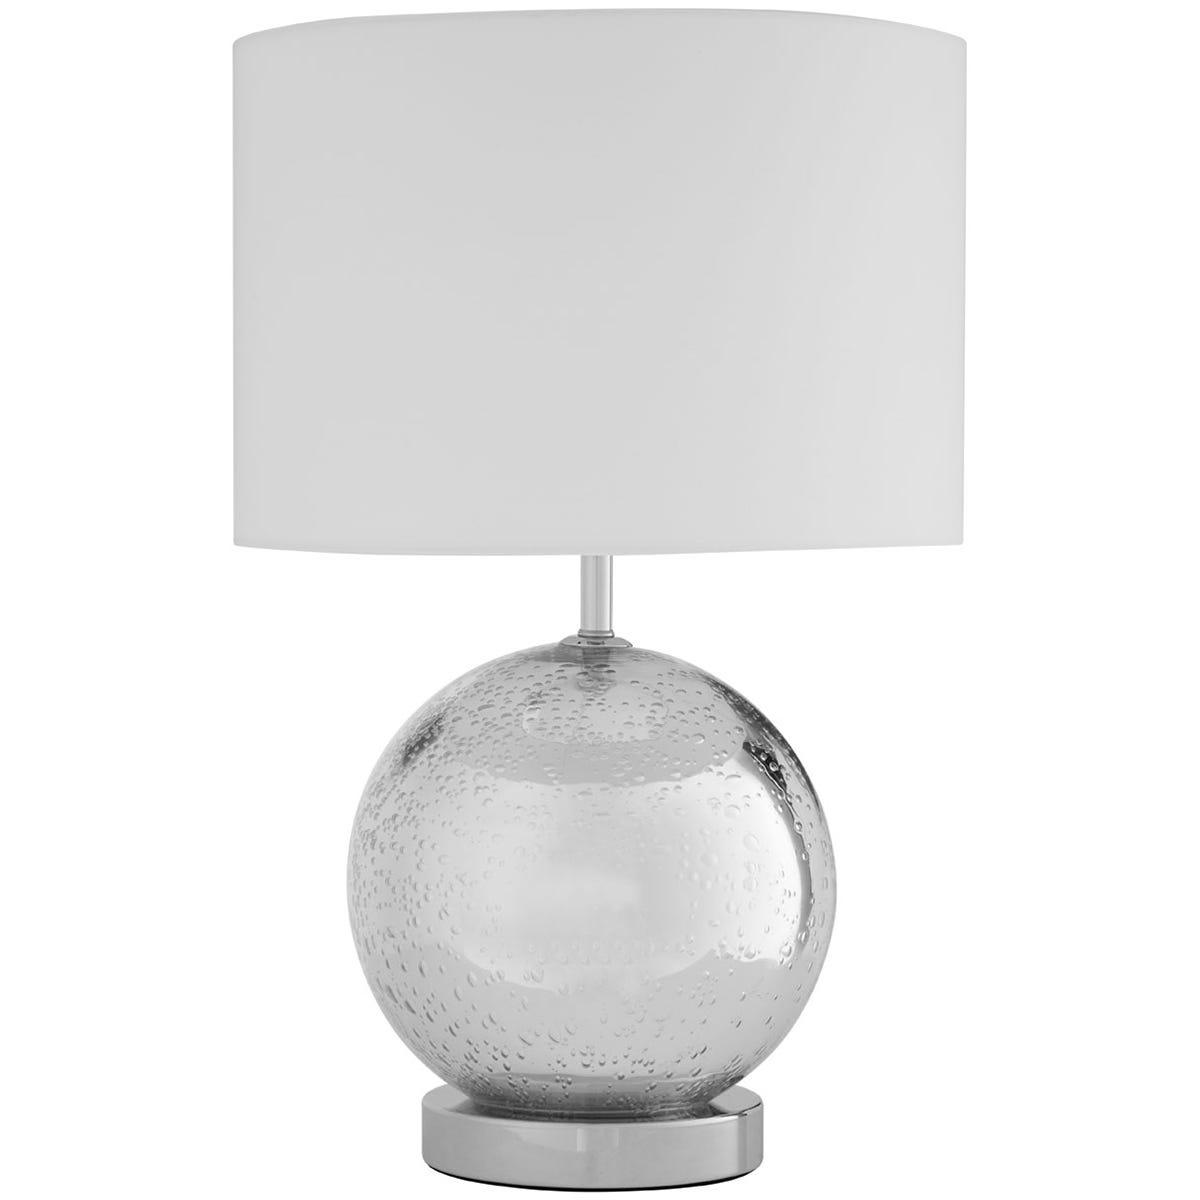 Premier Housewares Naomi Table Lamp Glass / Chrome Fabric Shade / UK Plug